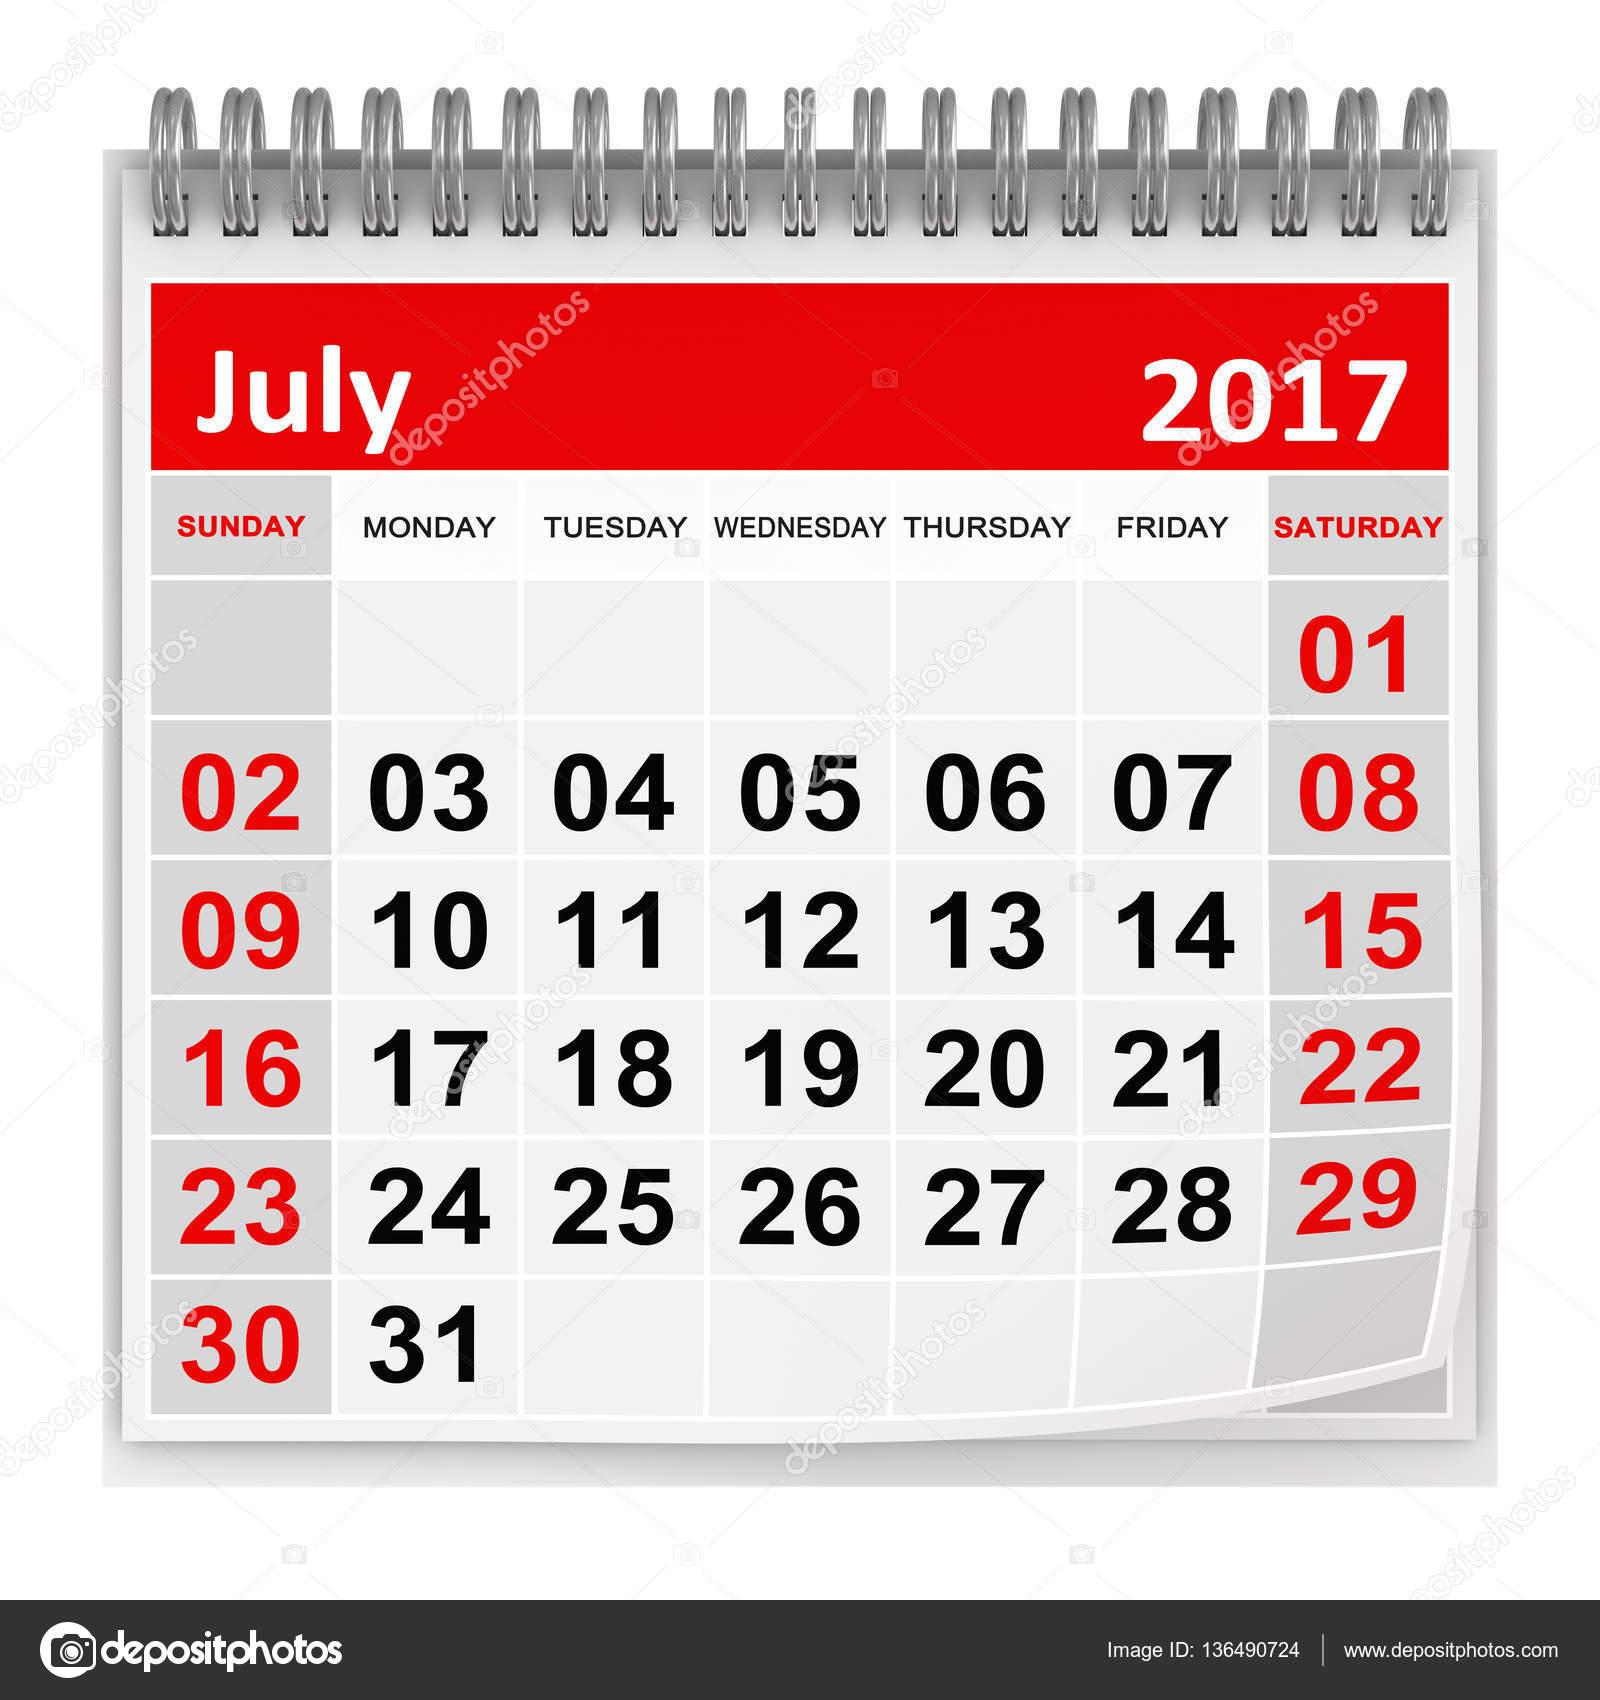 Calendar - July 2017 — Stock Photo © adempercem #136490724